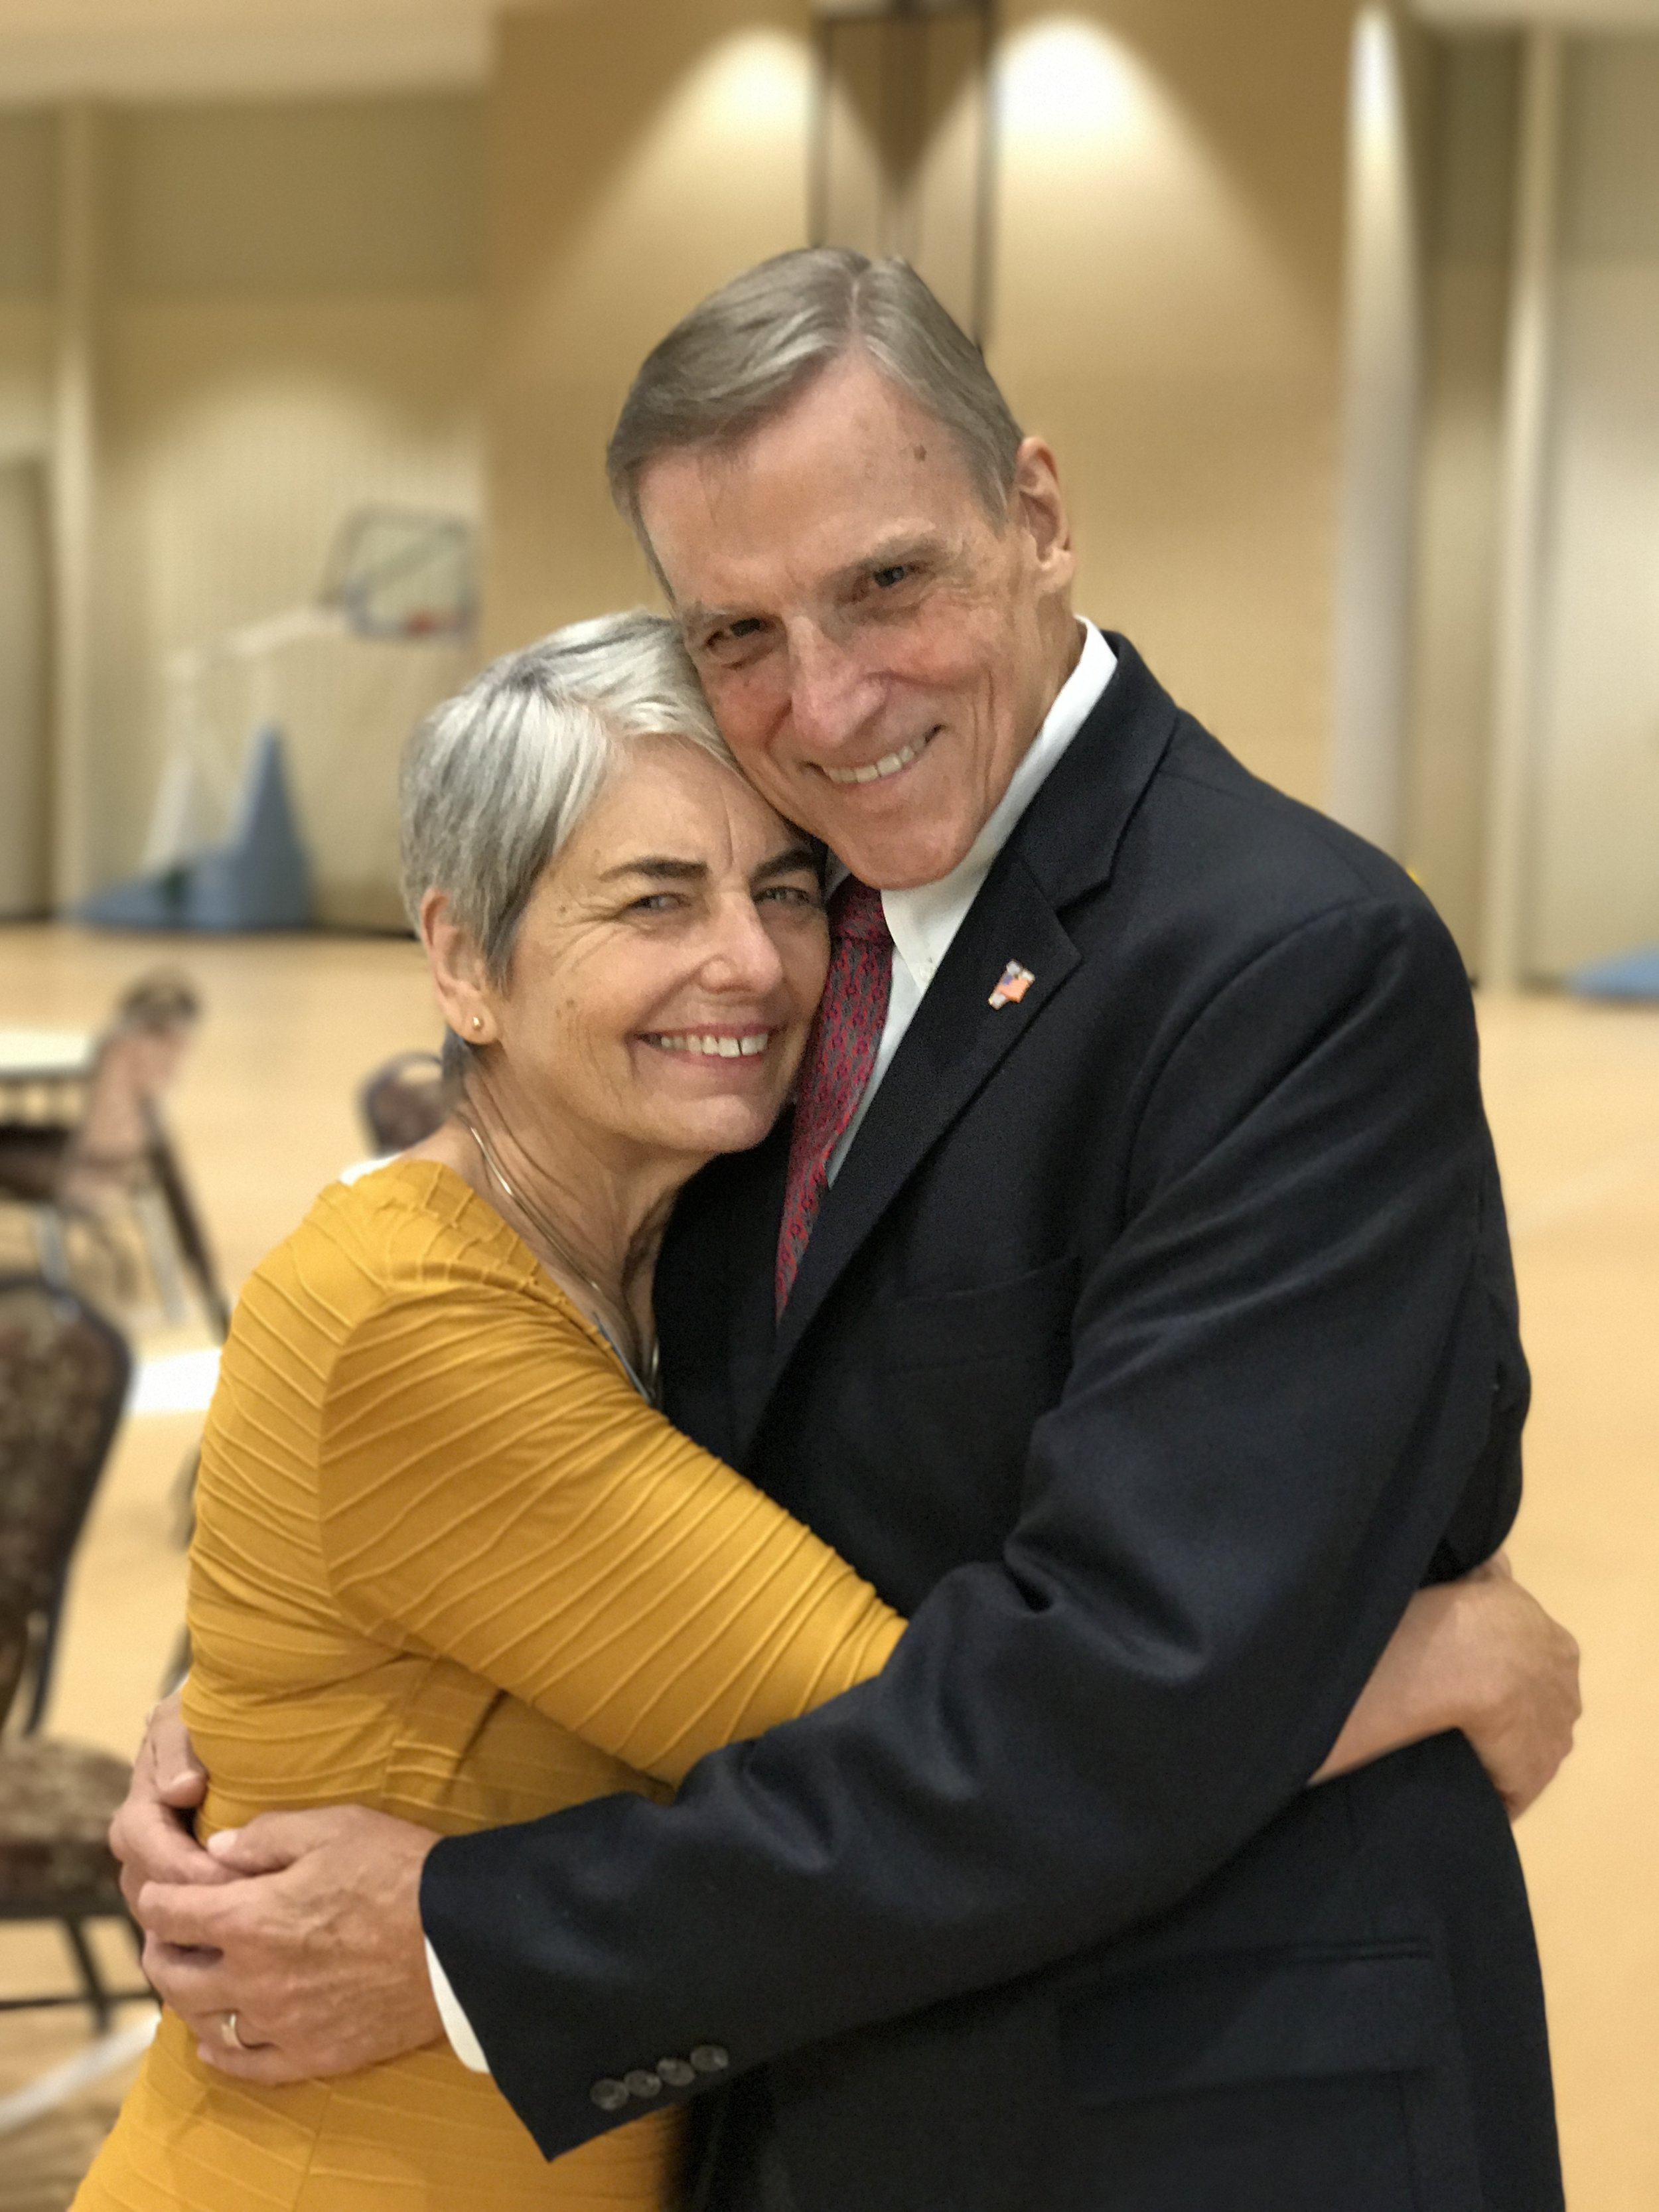 Jim & Mary Schulist